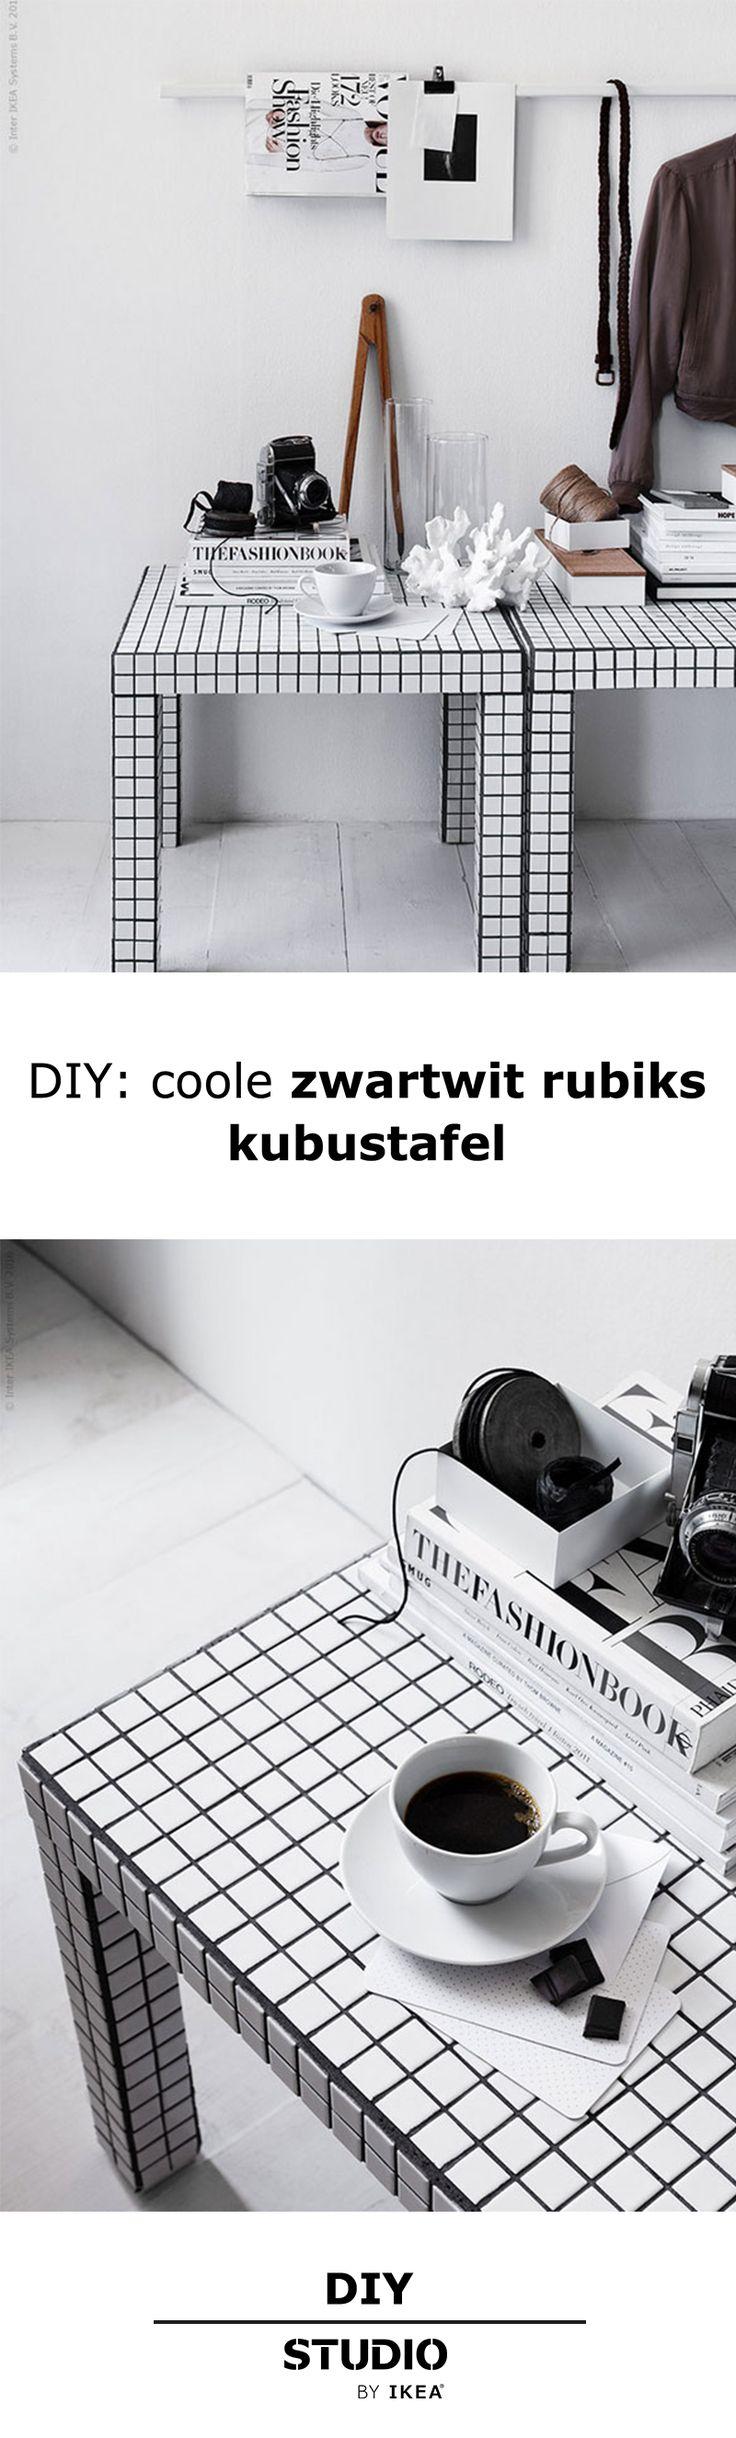 DIY: coole zwartwit rubiks kubustafel   IKEA IKEANederland LACK salontafel bijzettafel tafel zwartwit